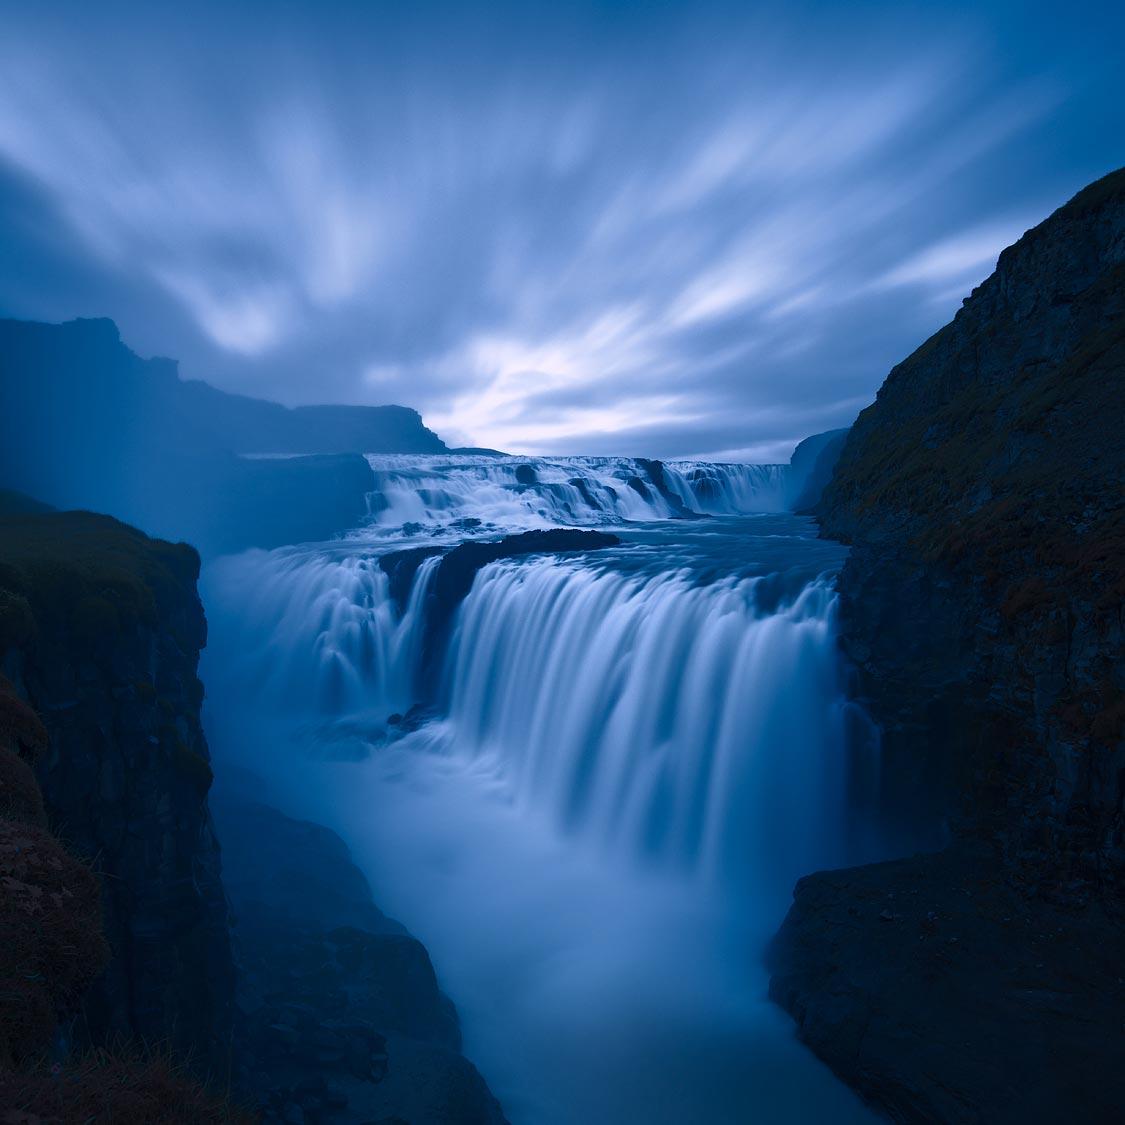 Jérôme Berbigier - Iceland - Gullfoss-Night